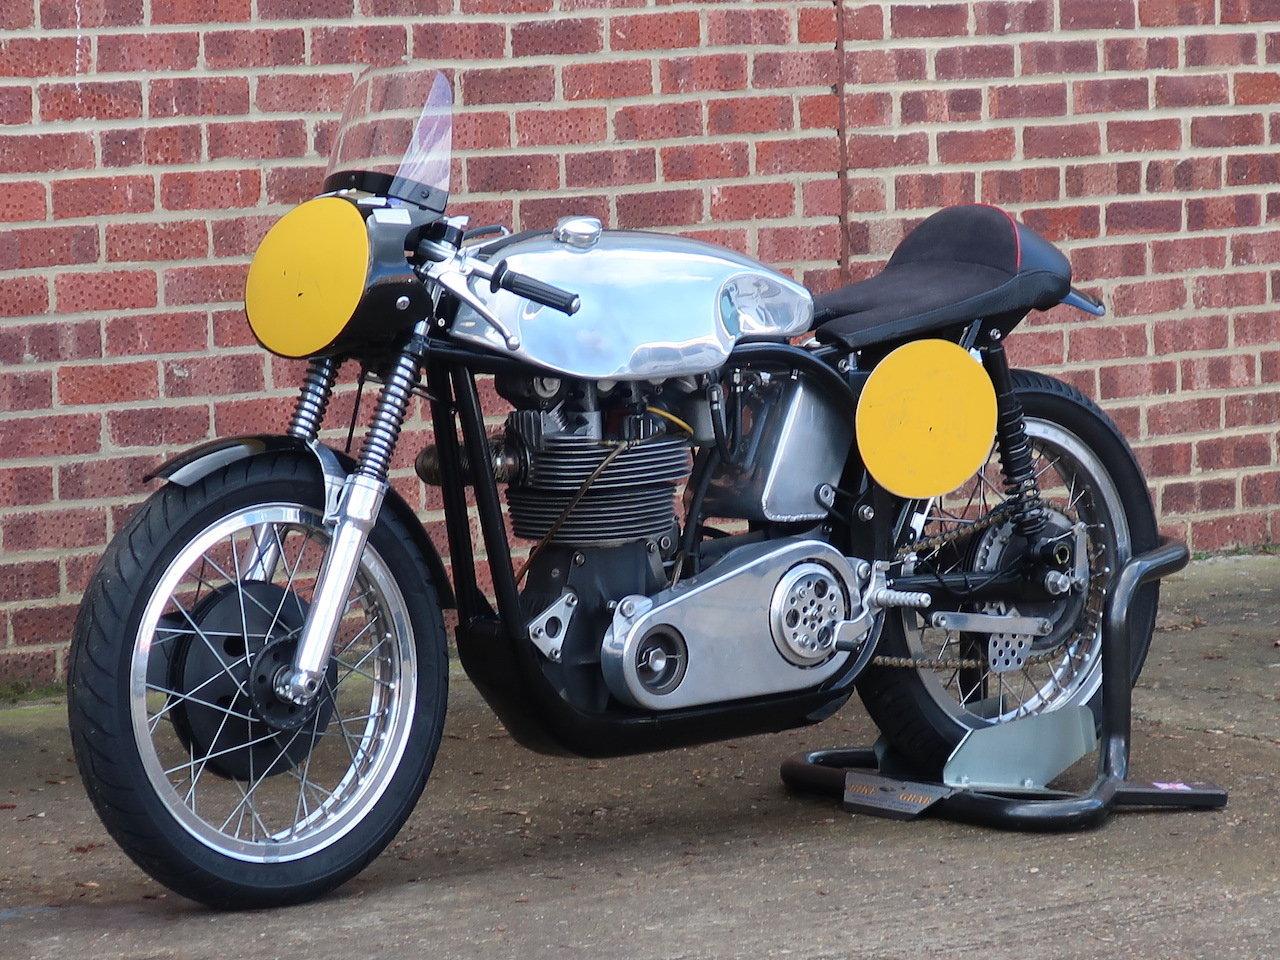 2007 Norton M30 Manx 500cc Race Bike For Sale (picture 6 of 6)